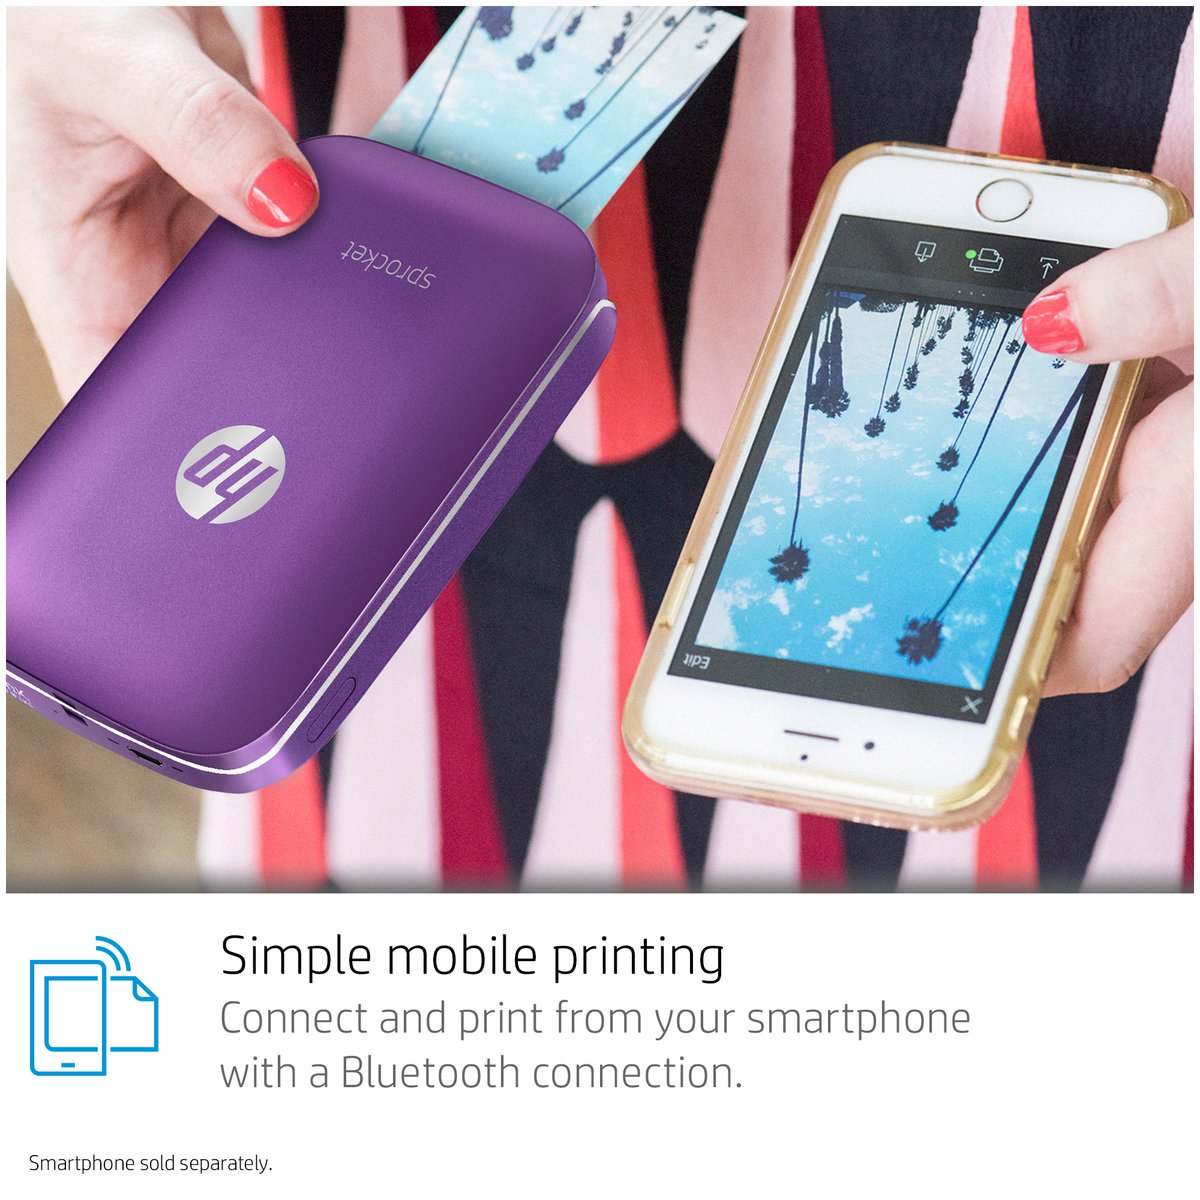 Hot Deals Hp Sprocket Photo Printer White Harvey Norman Au Ink Free Mobile Technology